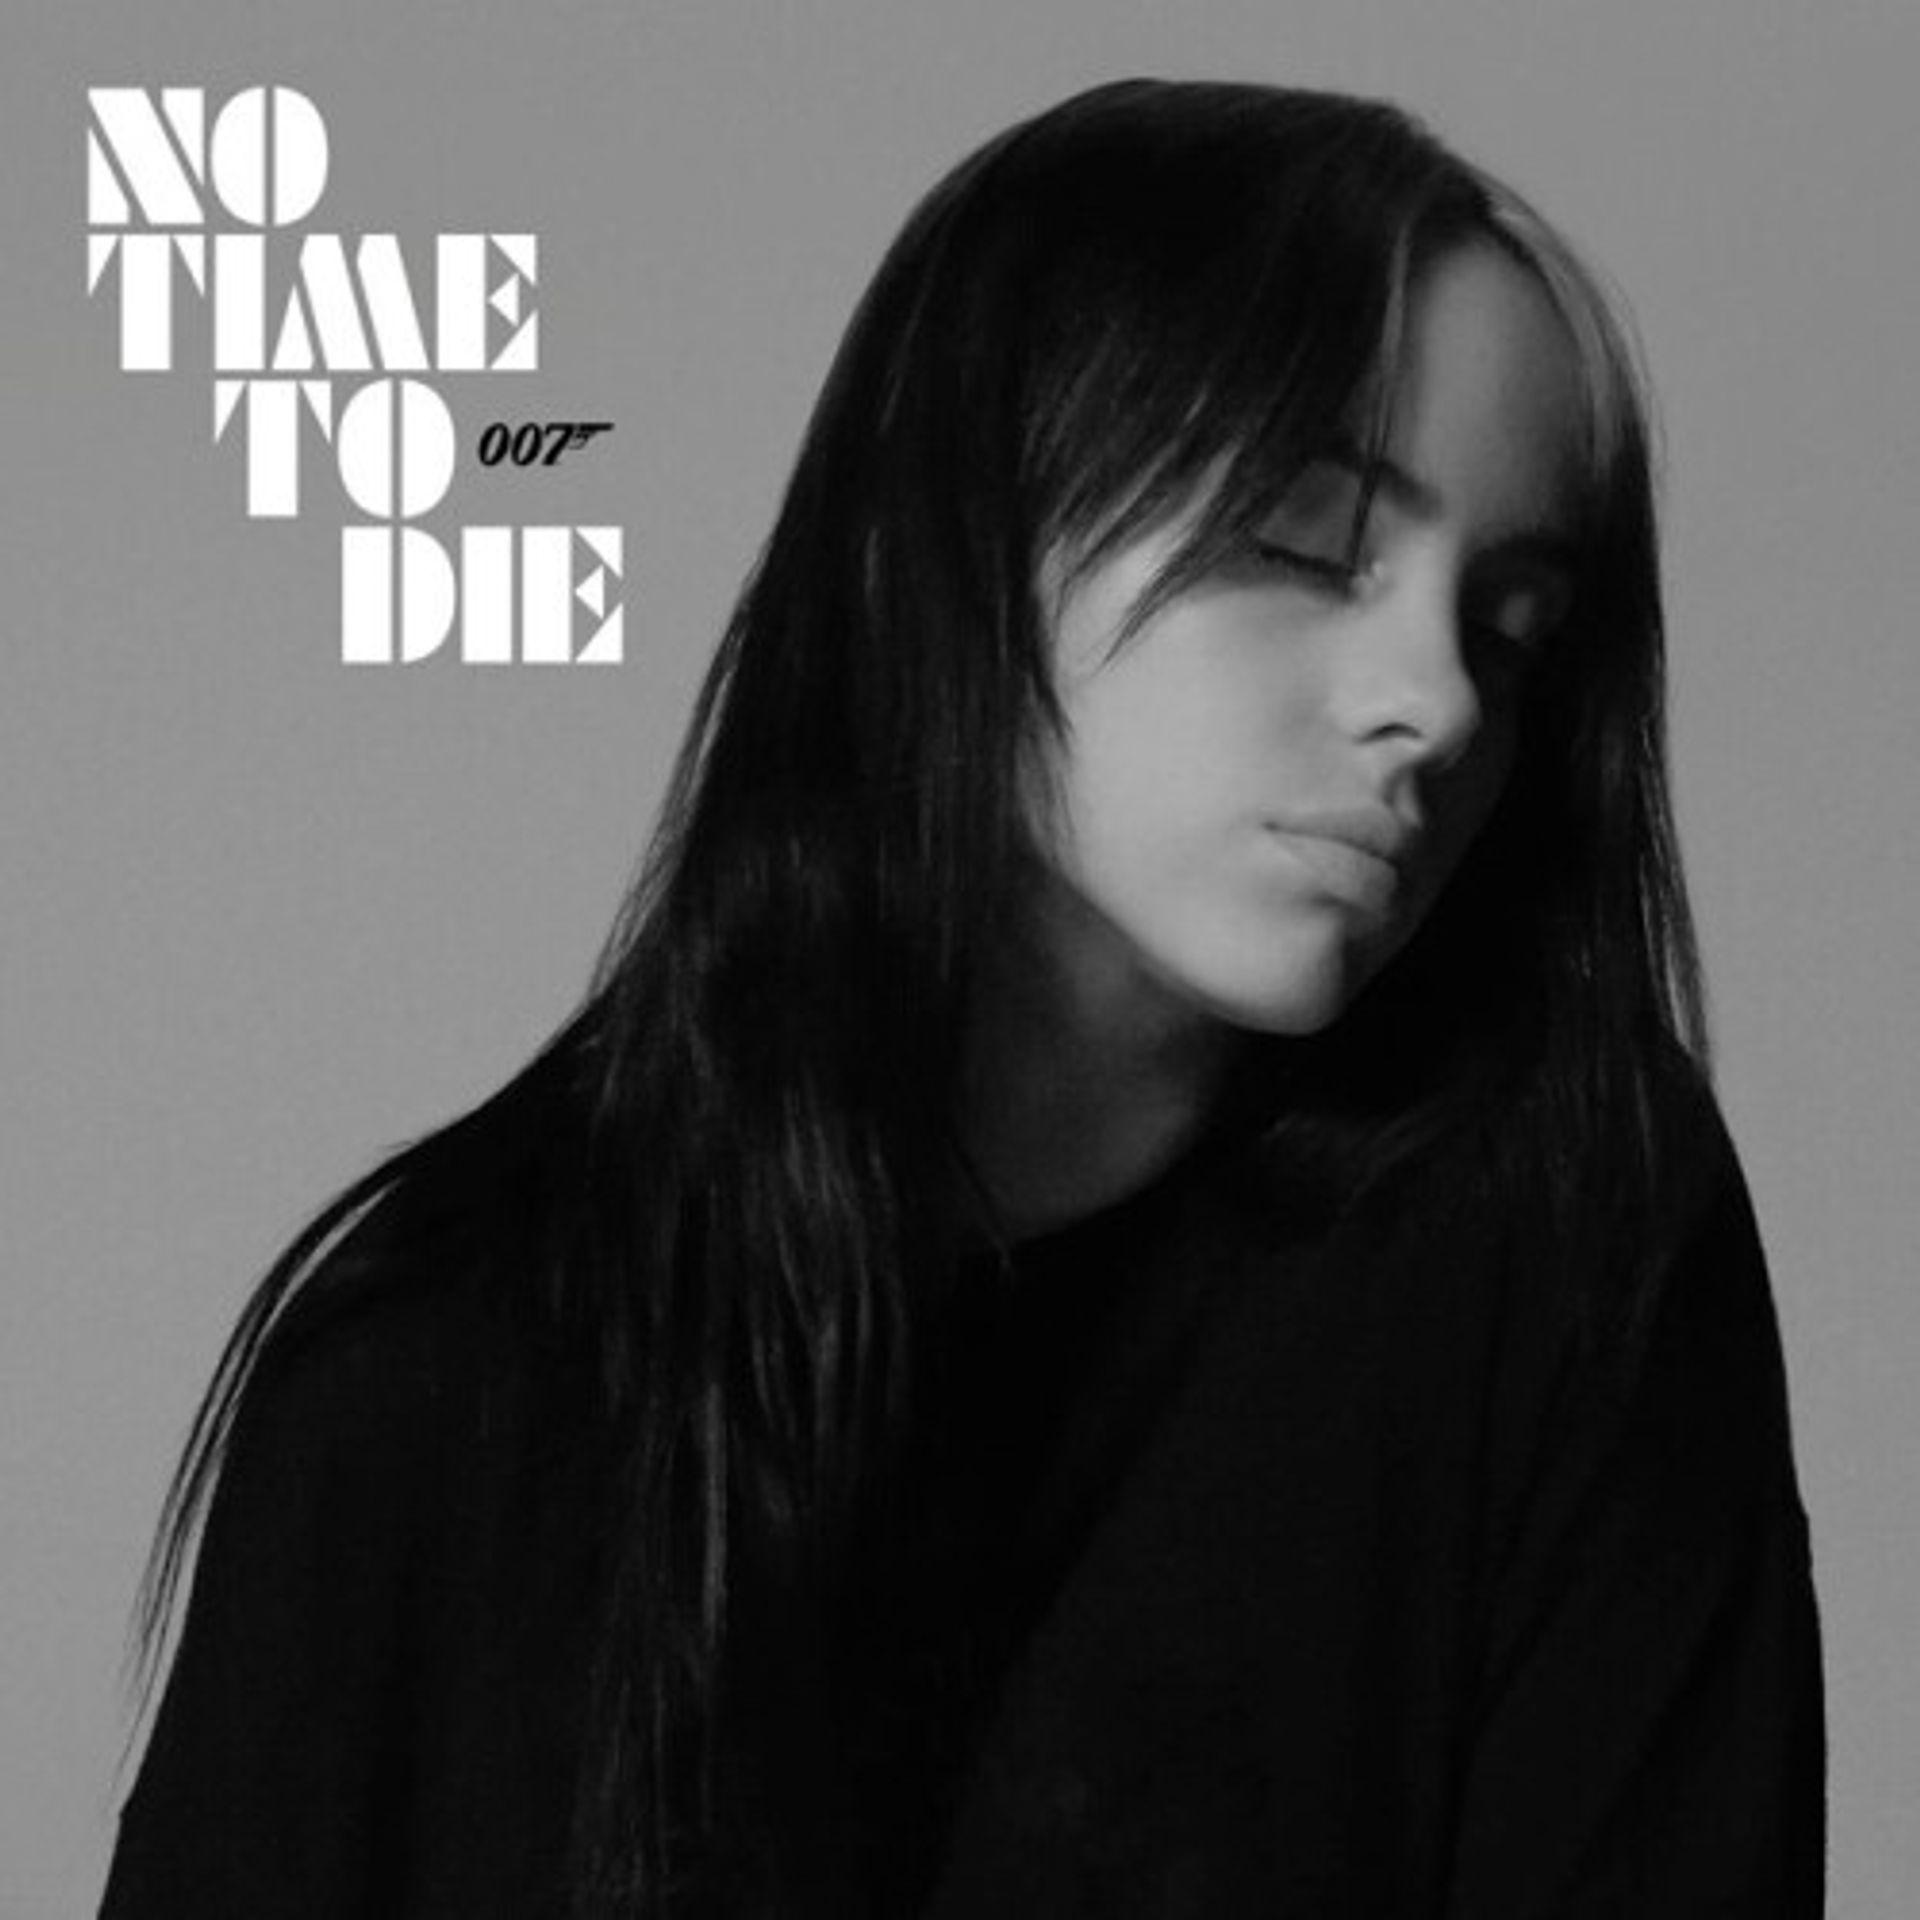 NTM #220 met o.a. Billie Eilish, Tame Impala en The Strokes